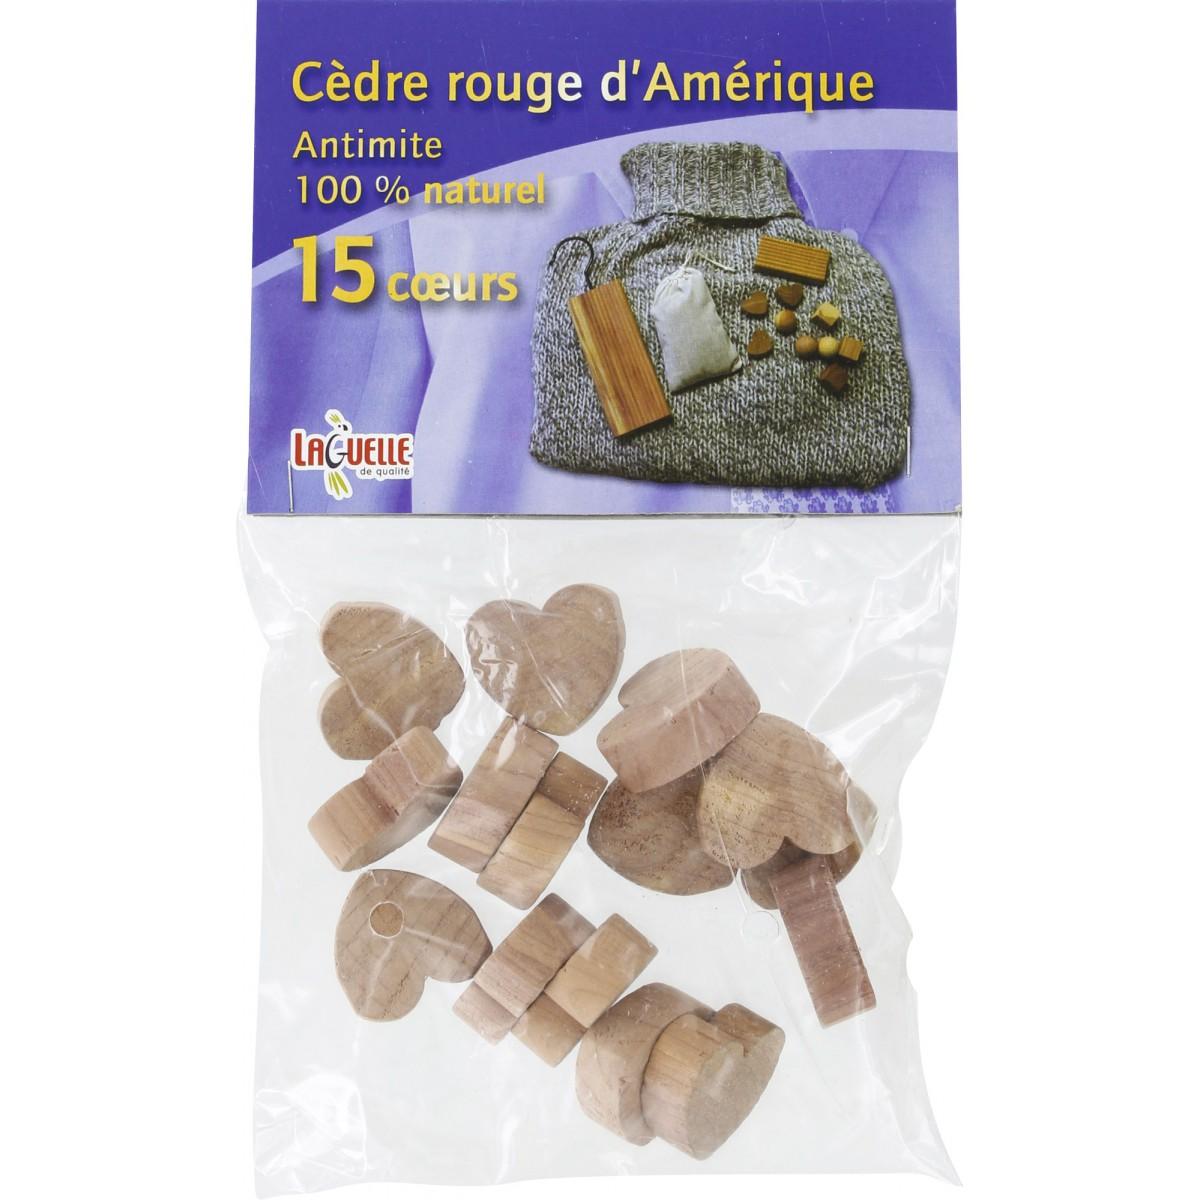 antimites 100 naturel laguelle 15 coeurs de anti mites 1071989 mon magasin g n ral. Black Bedroom Furniture Sets. Home Design Ideas